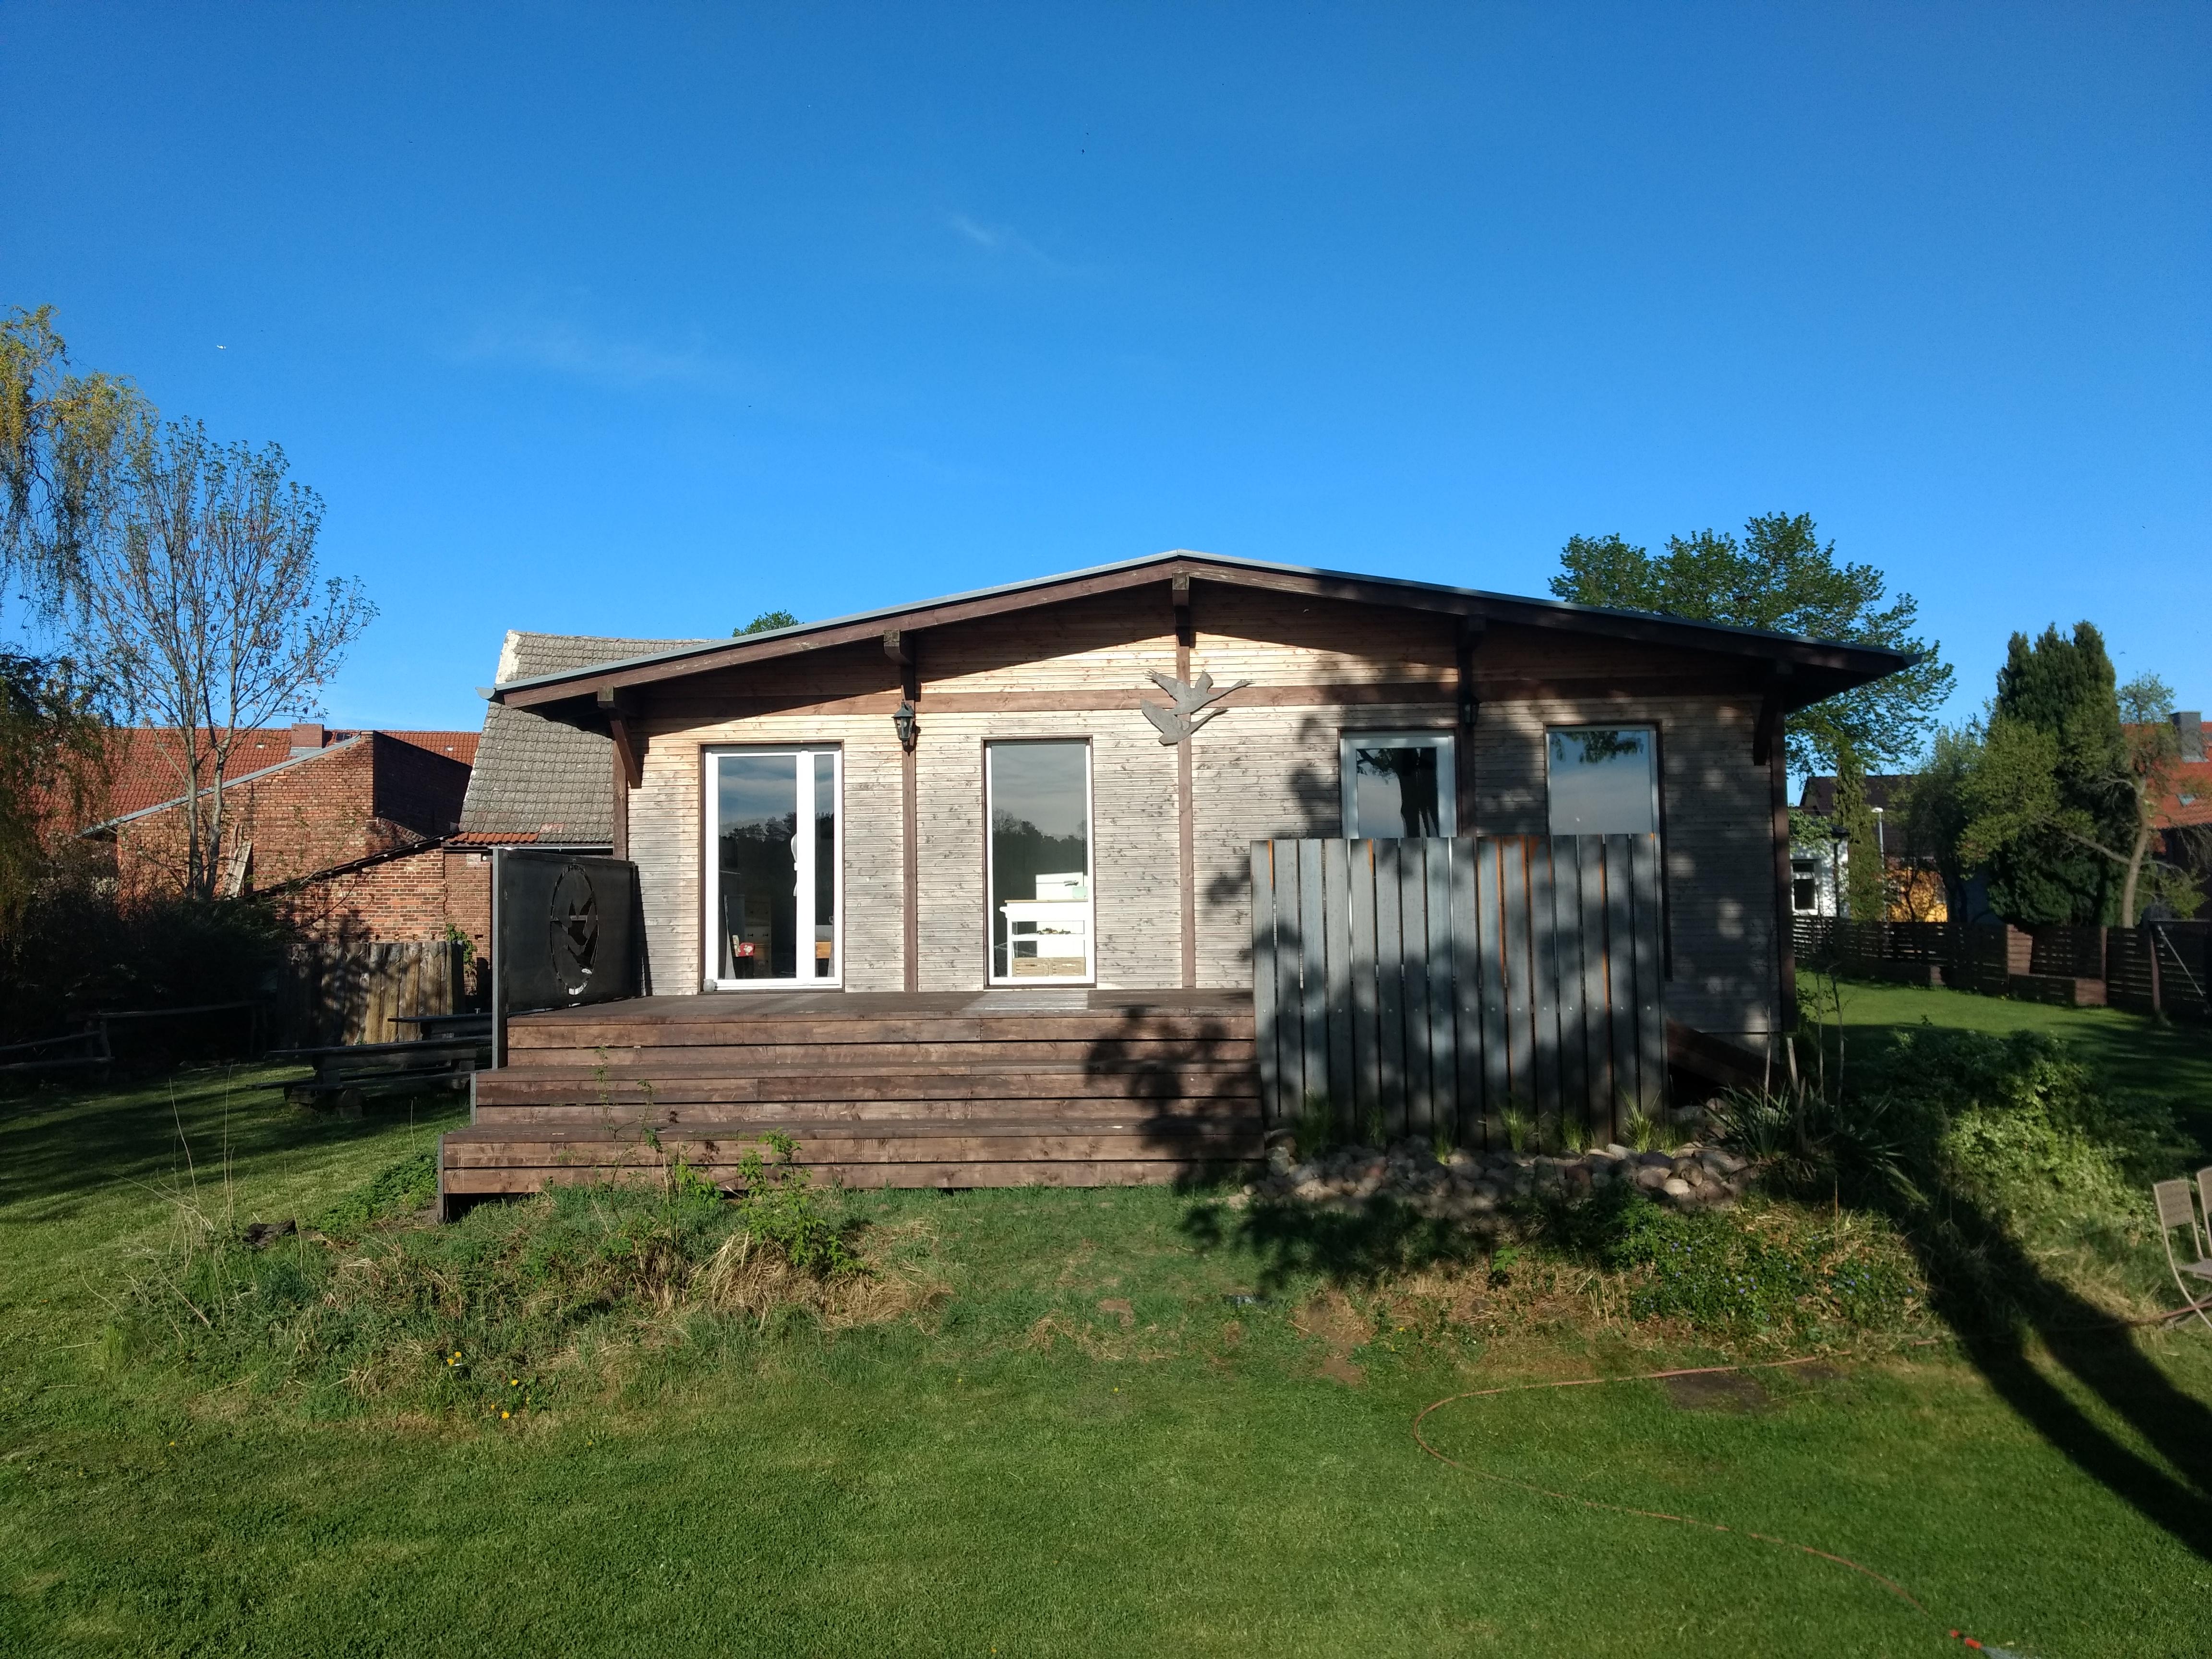 Terrasse Ferienhaus…fertig